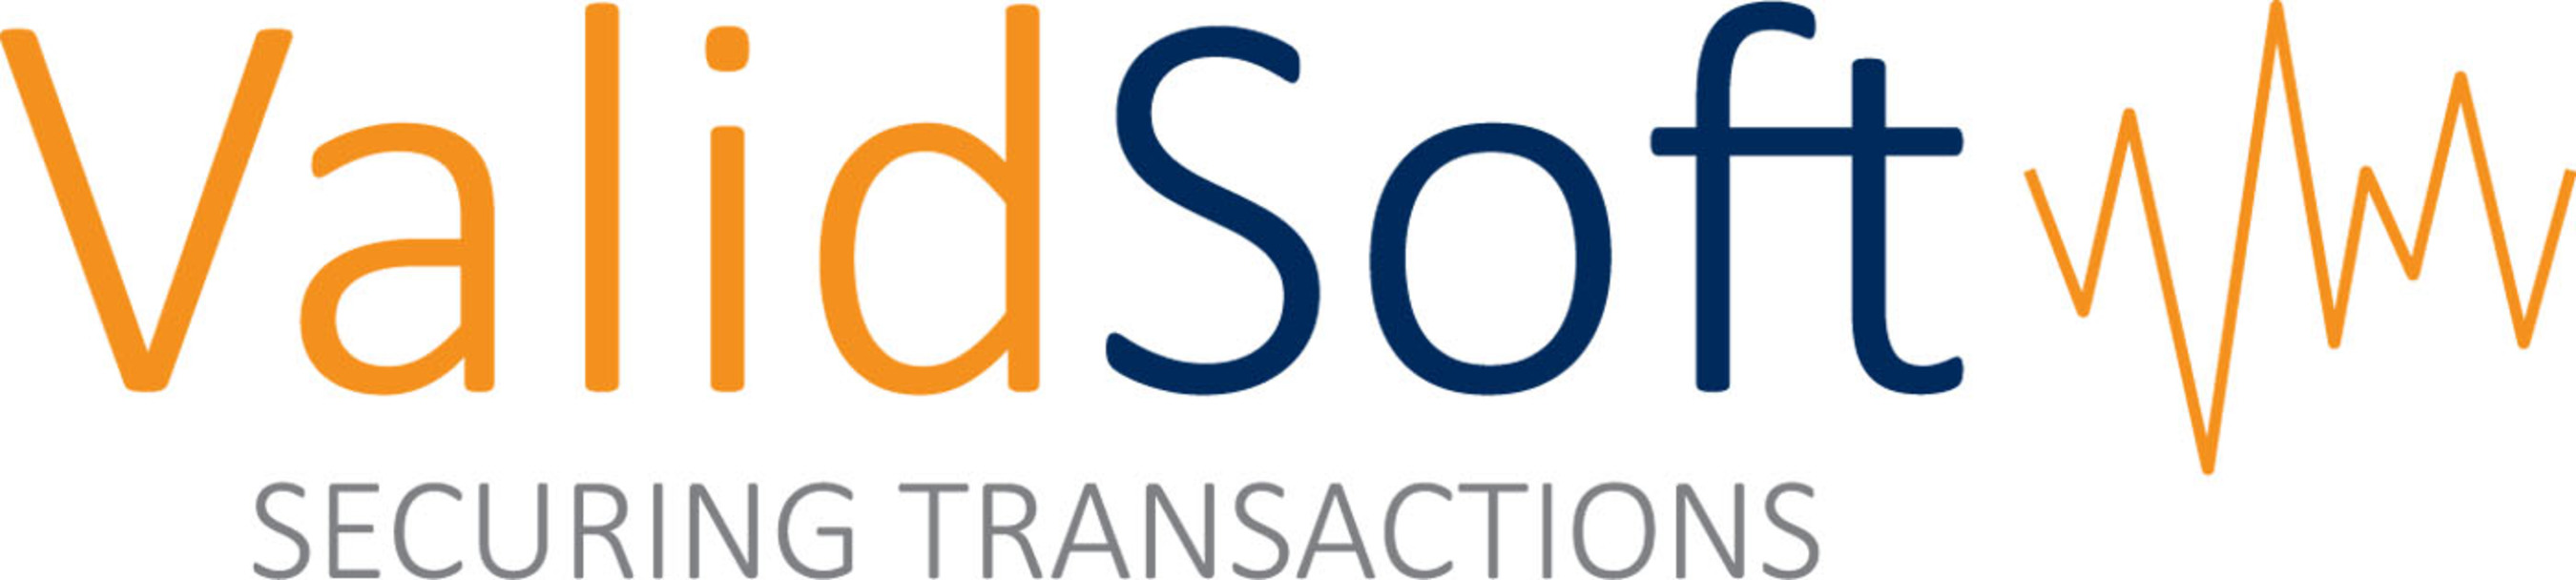 ValidSoft's logo.